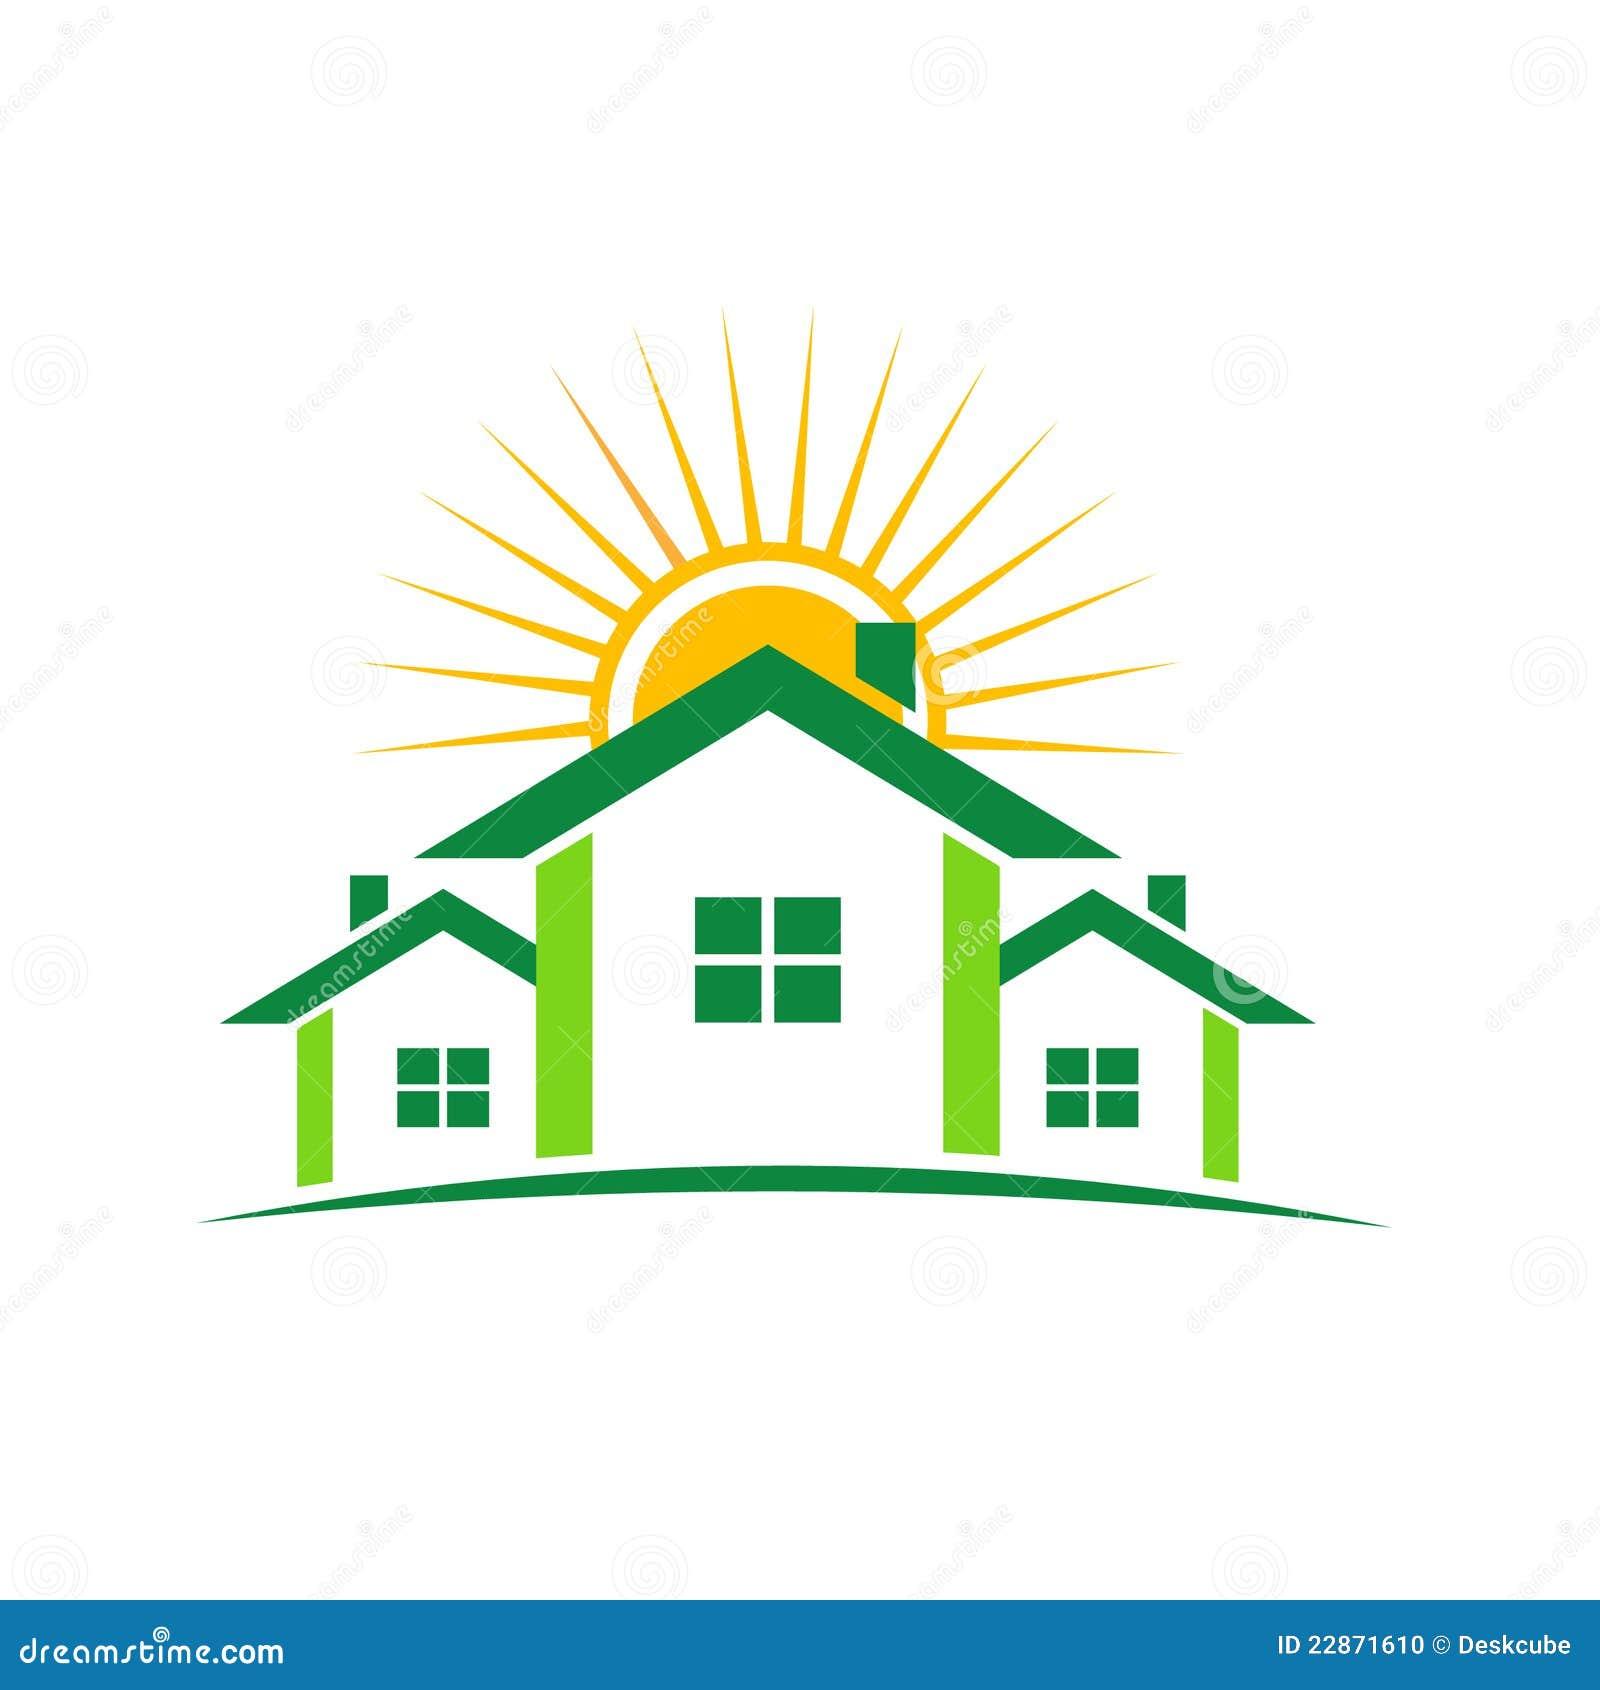 sunny houses logo stock photo image 22871610